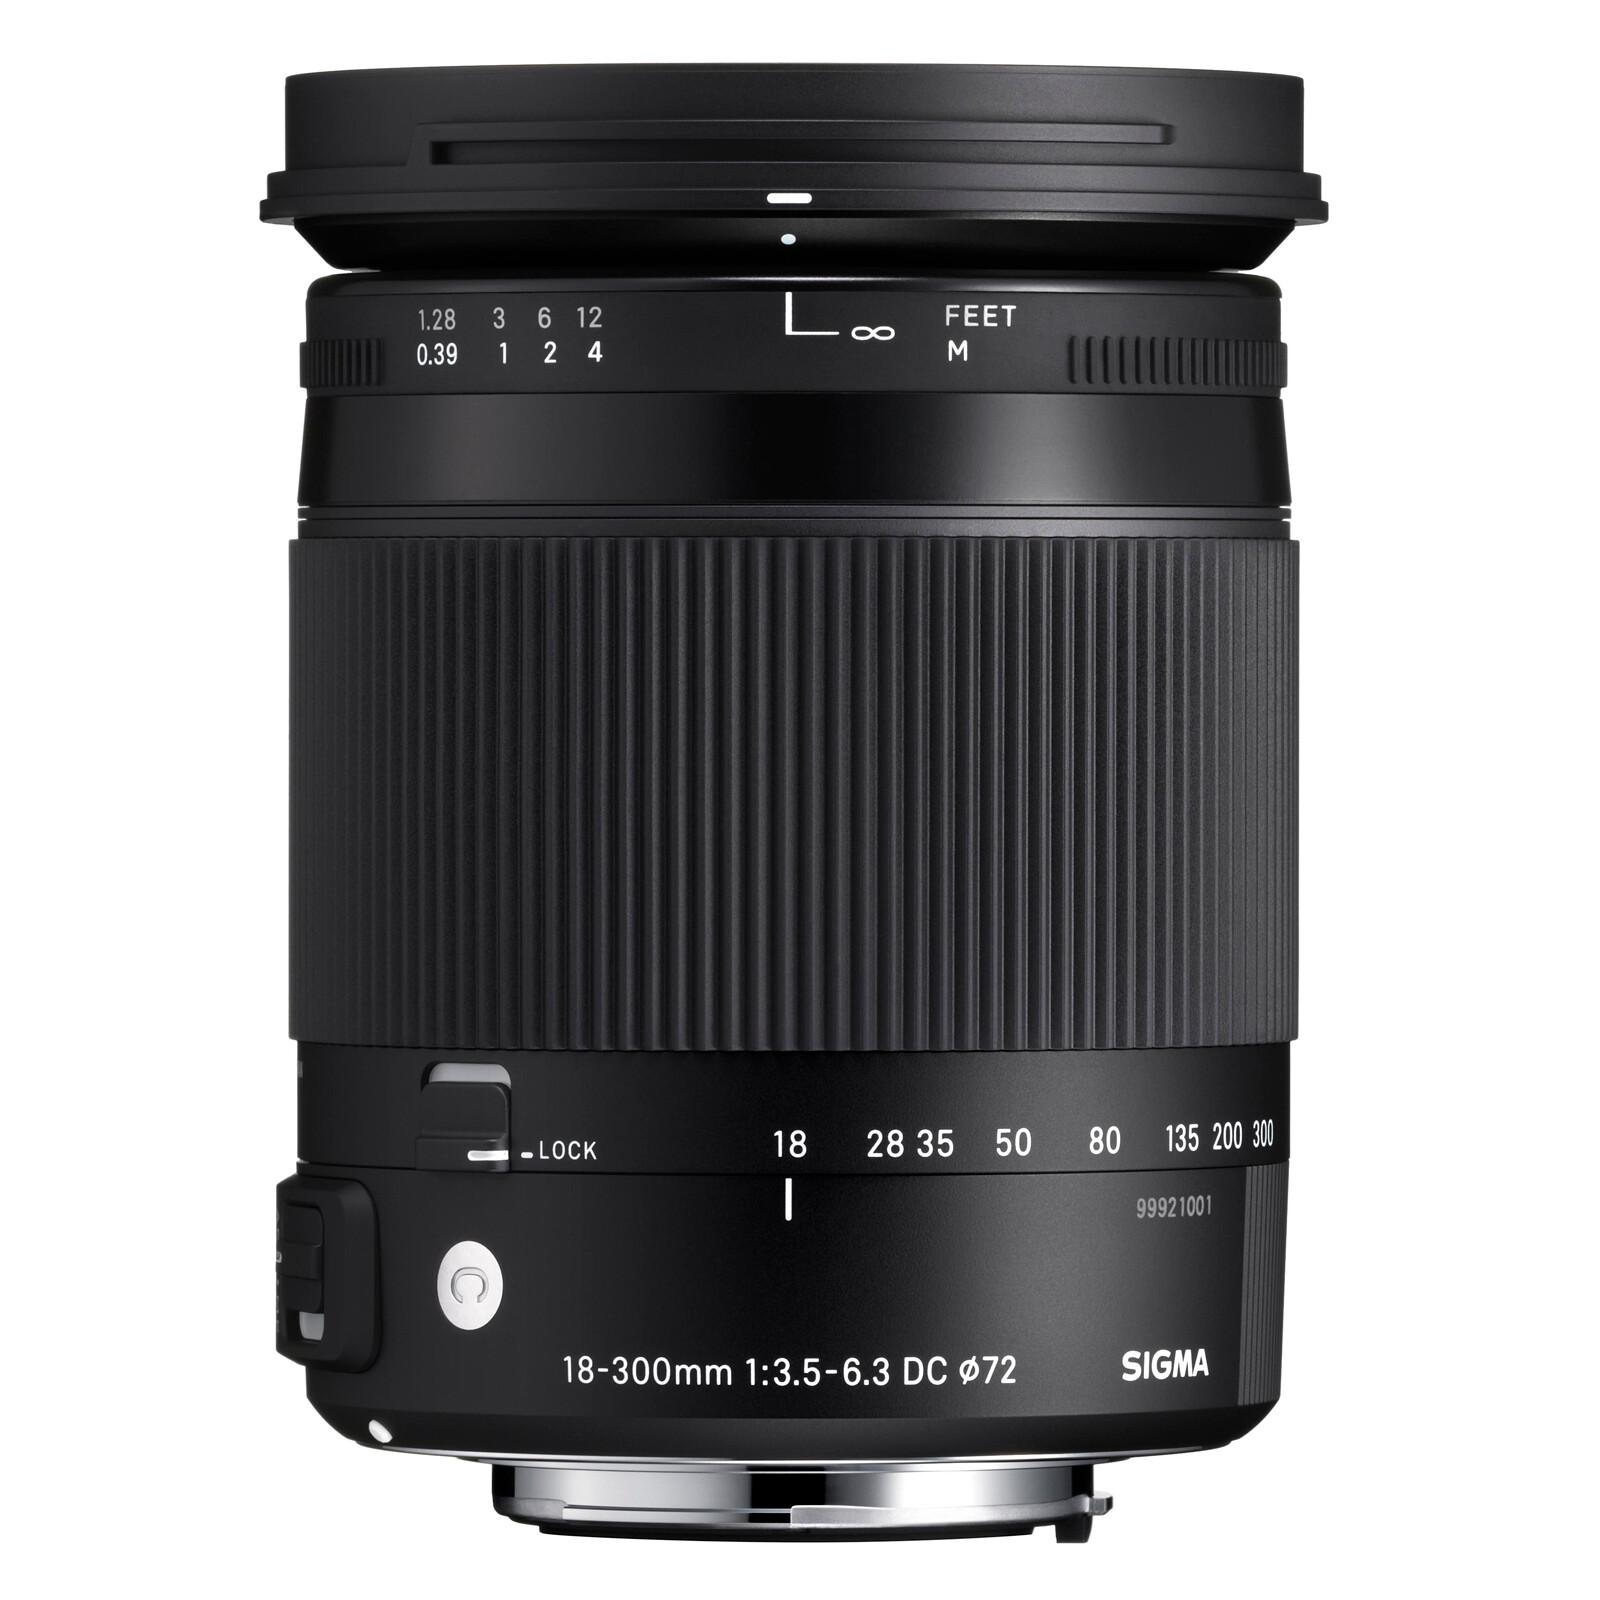 Sigma 18-300/3,5-6,3 DC OS HSM Sigma + UV Filter